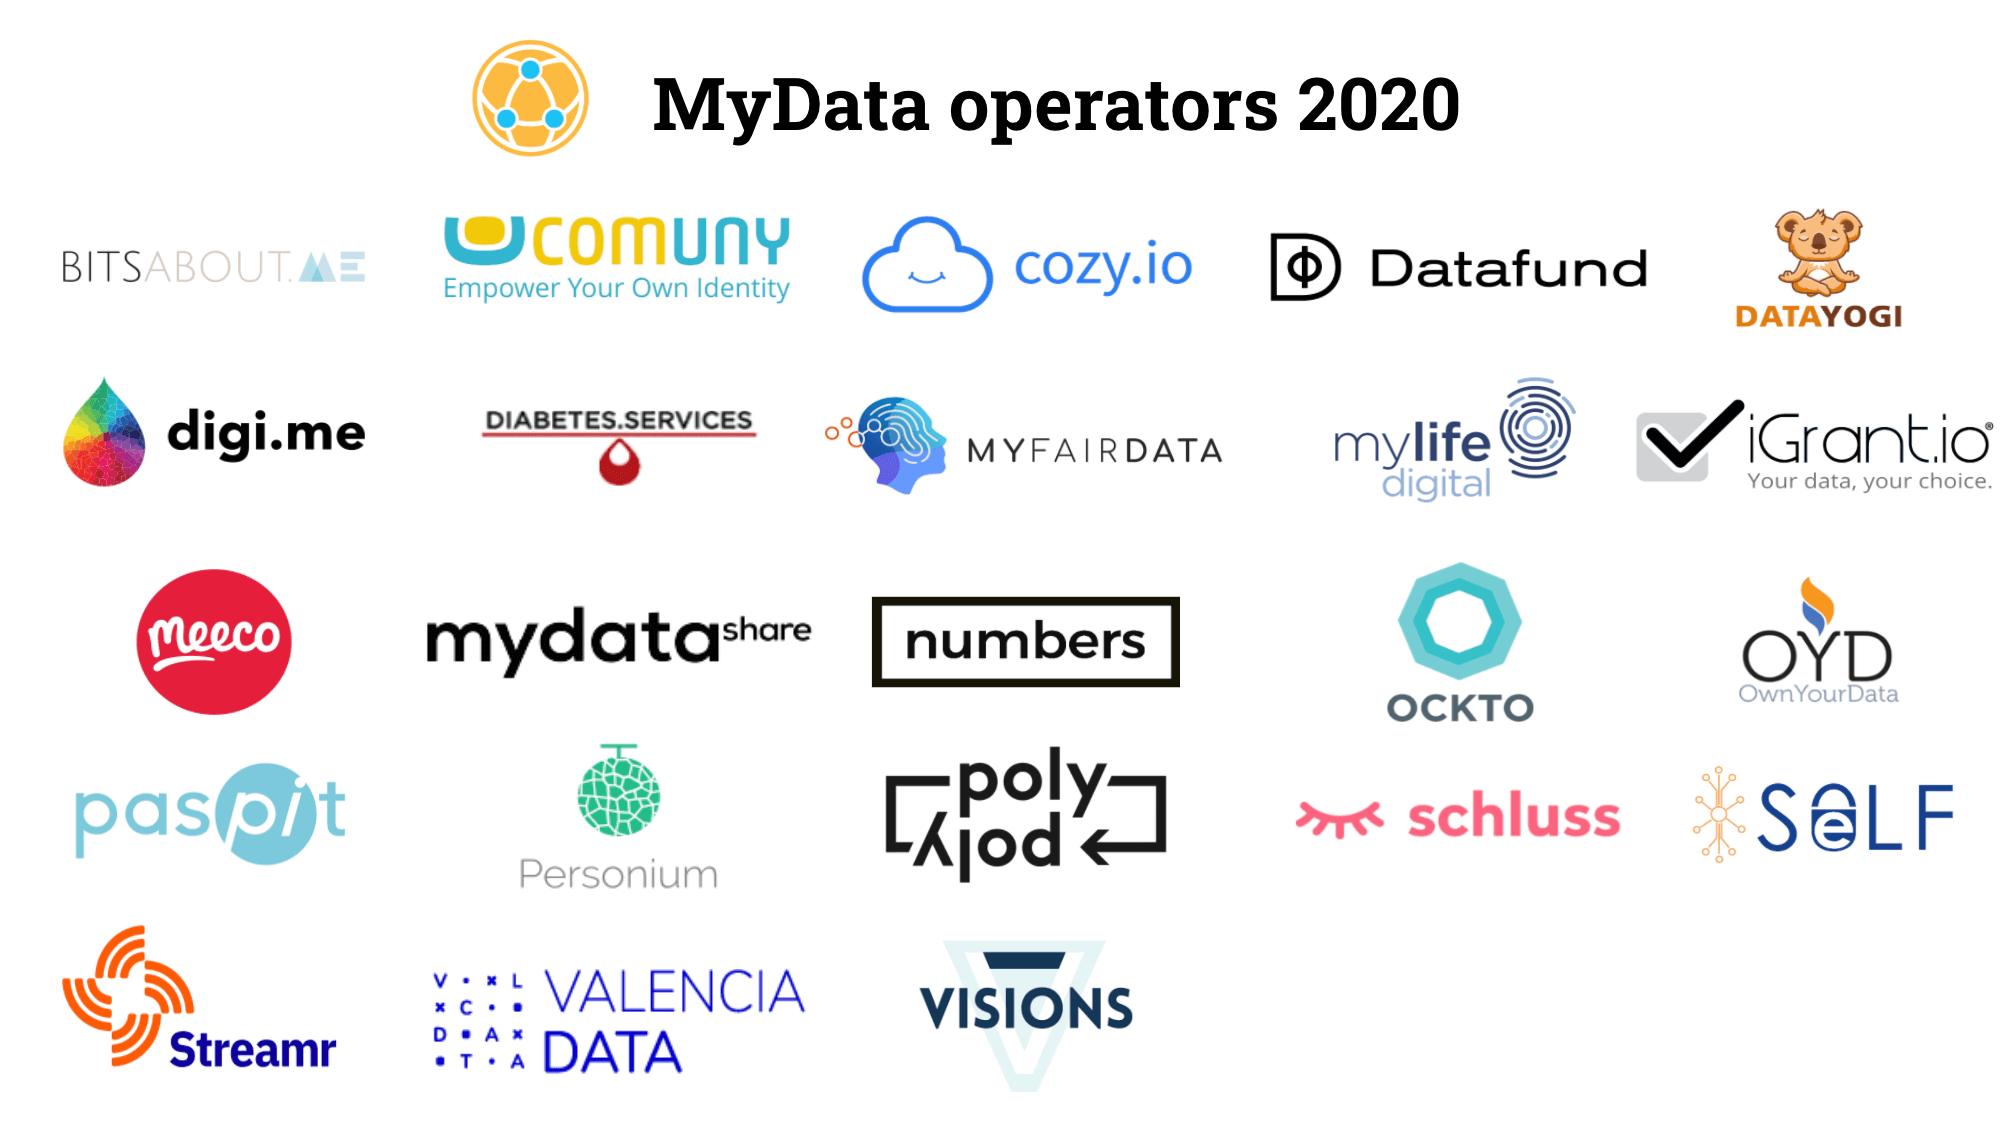 The MyData Operator 2020 Award